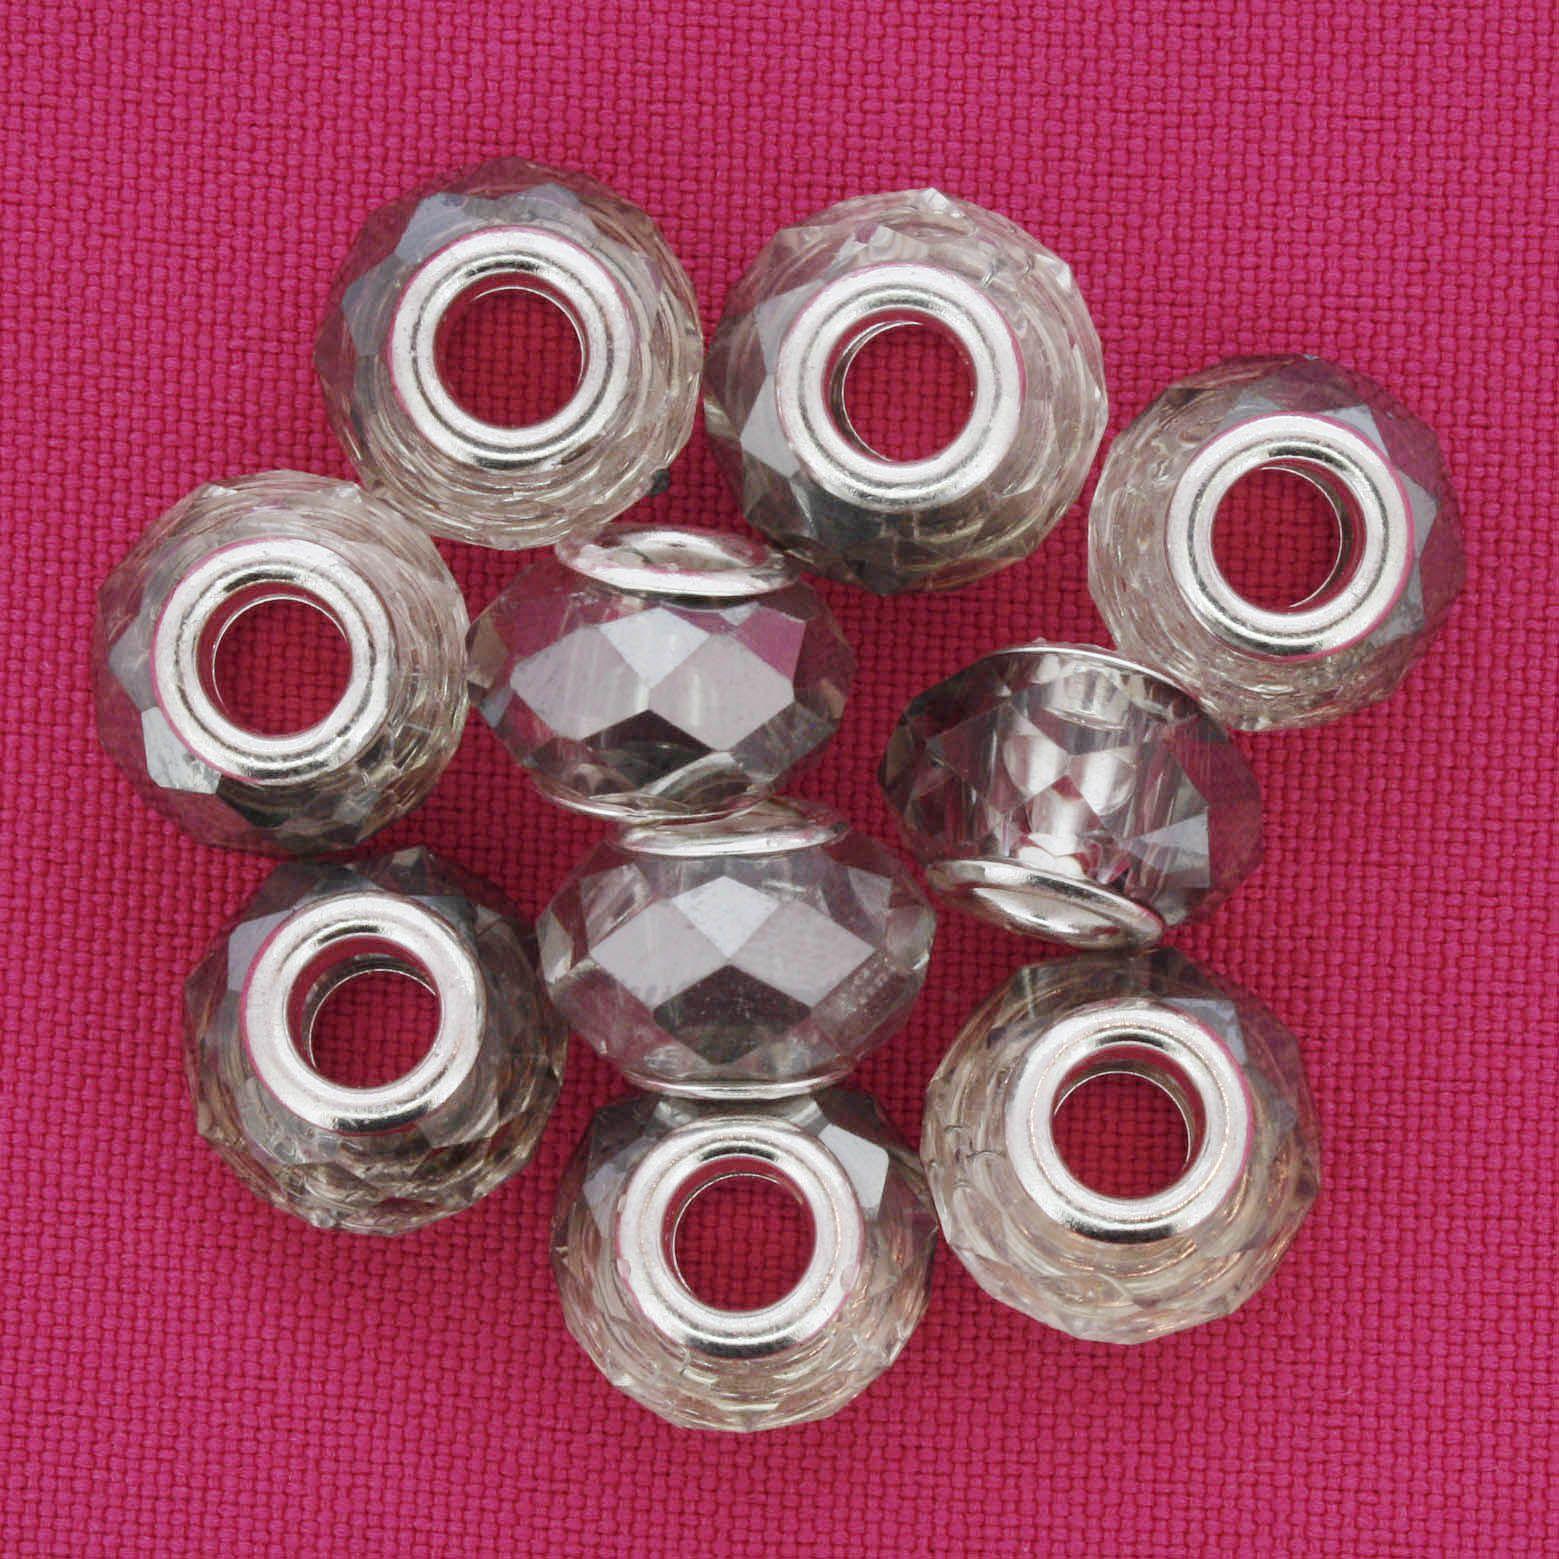 Berloque Crystal® - Fumê - Níquel  - Stéphanie Bijoux® - Peças para Bijuterias e Artesanato